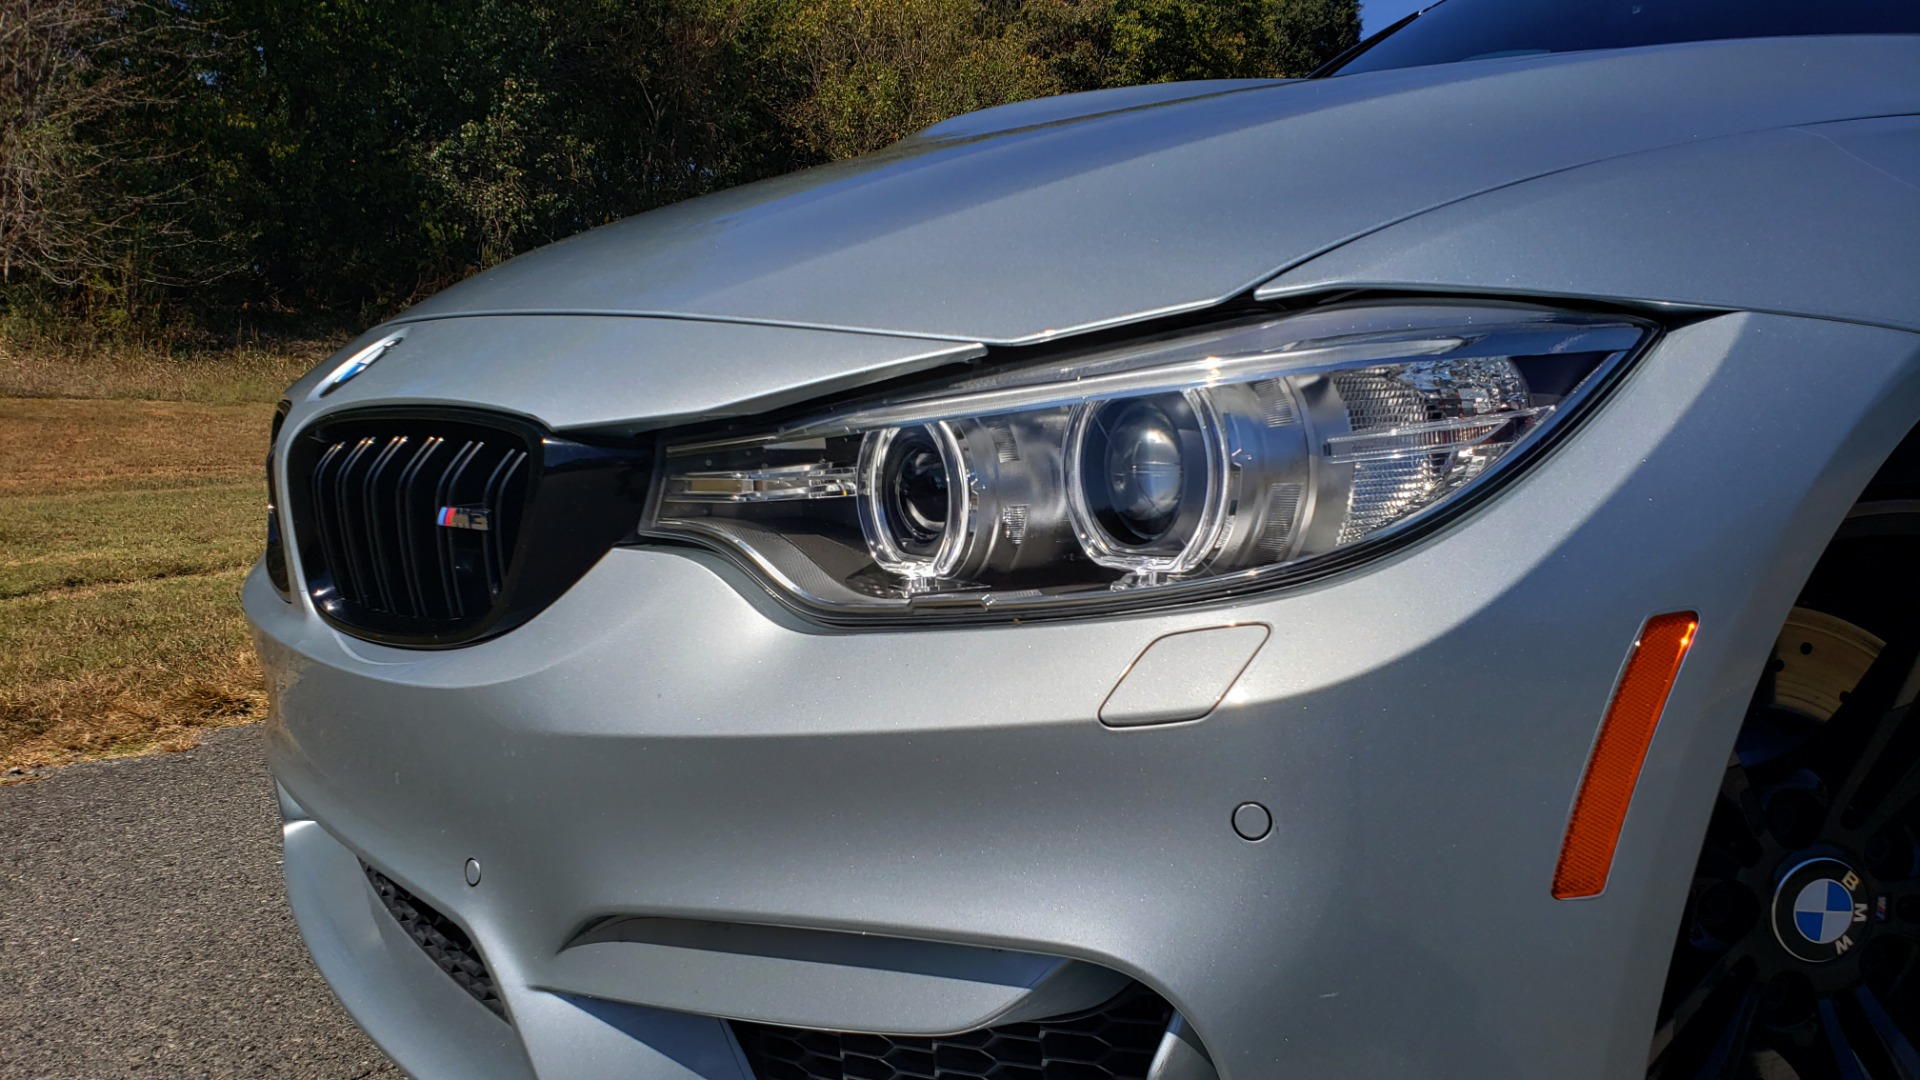 Used 2015 BMW M3 EXECUTIVE PKG / NAV / CAMERA / HUD / CARBON FIBER ROOF for sale Sold at Formula Imports in Charlotte NC 28227 8